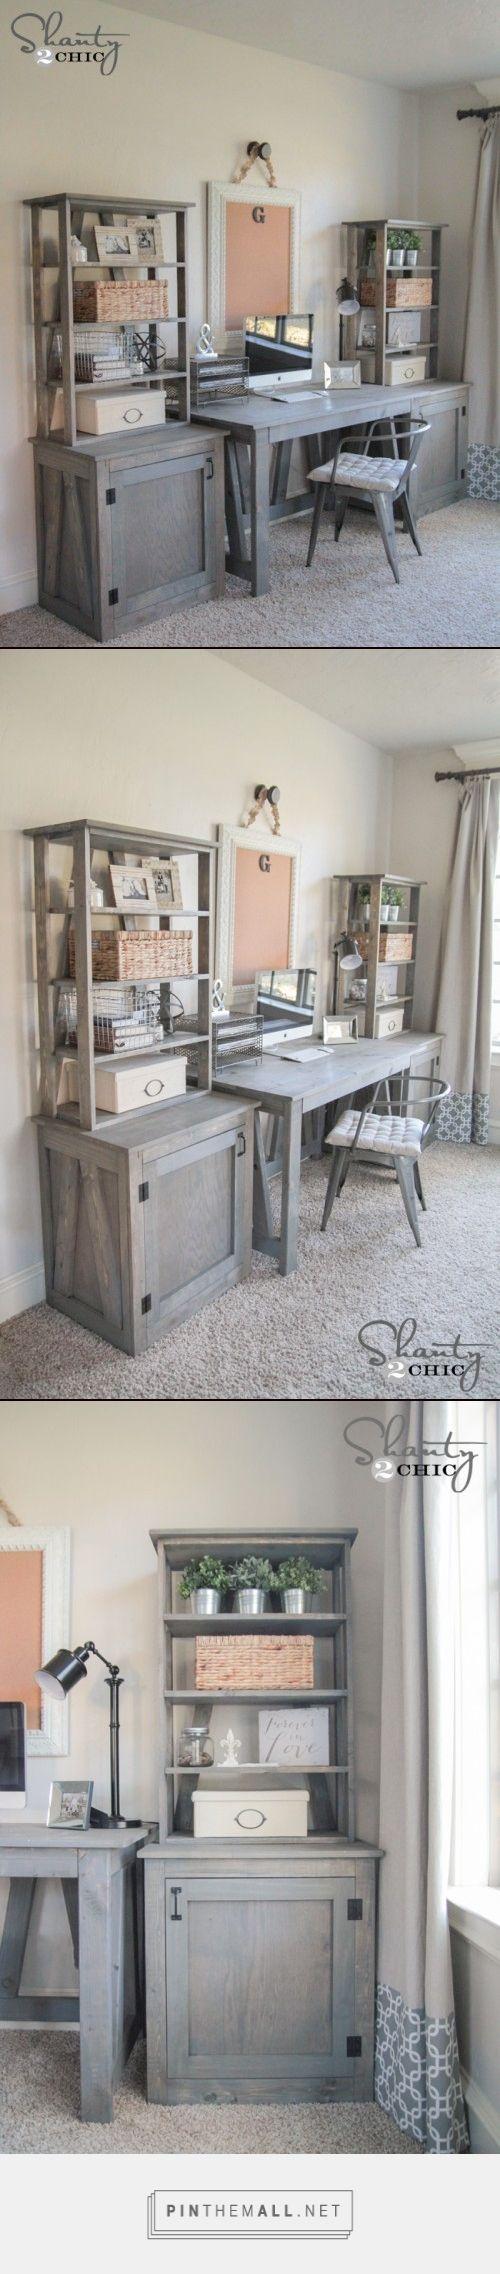 best  diy desk ideas on pinterest  desk ideas desk and craft  - diy bookcase  shanty  chic  a grouped images picture diy desk